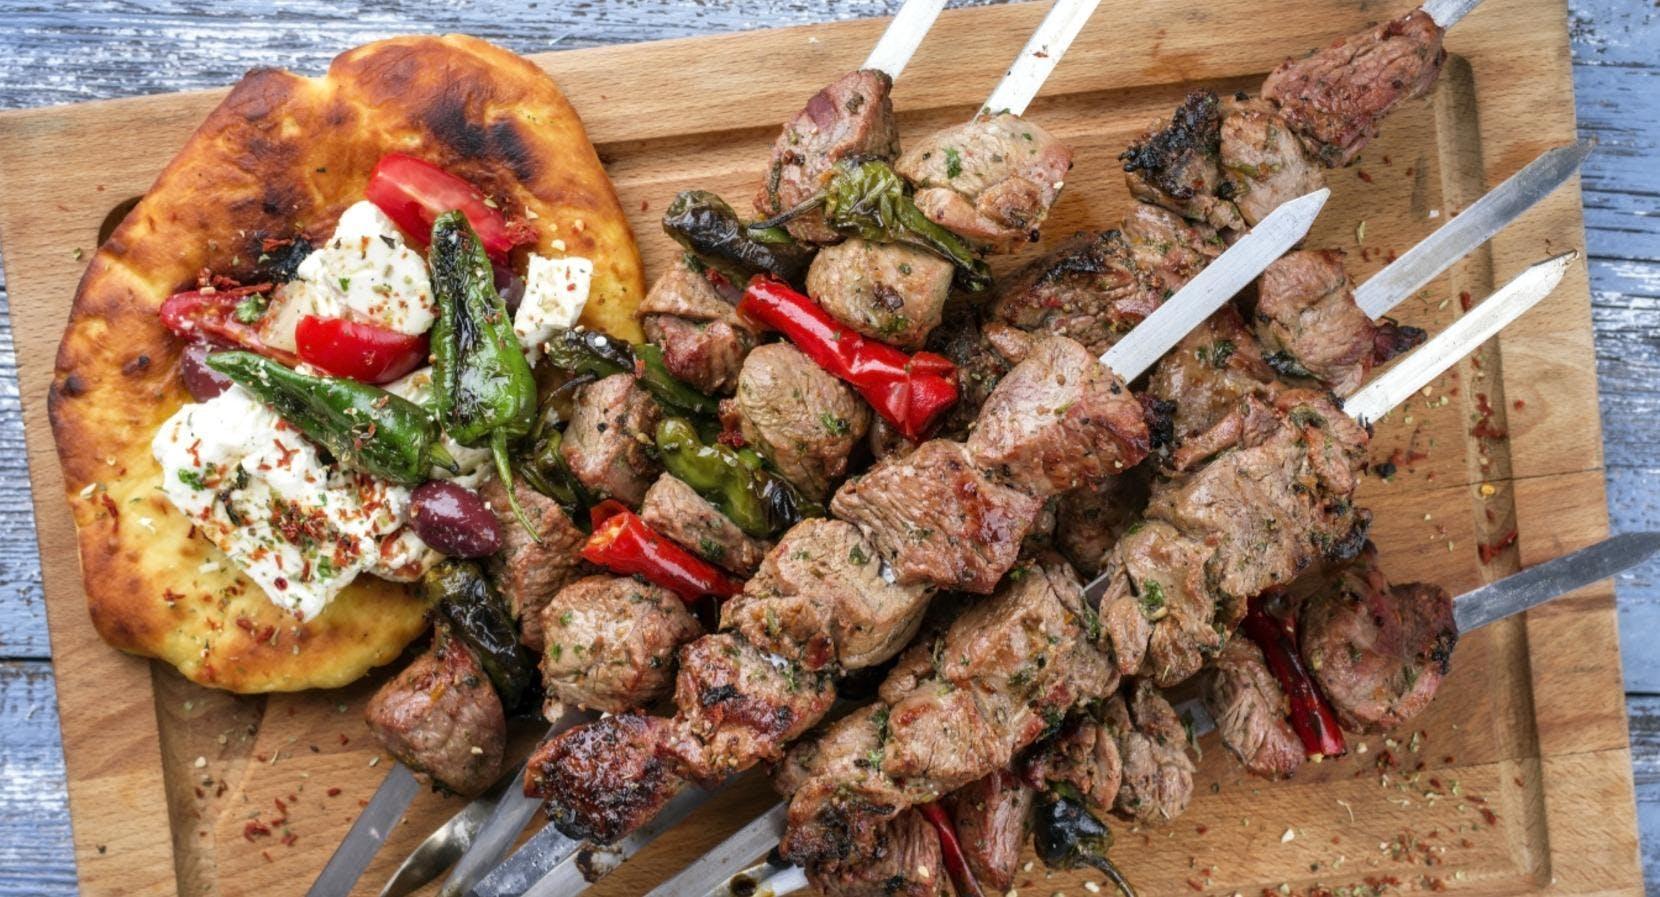 The Sheesh Turkish BBQ